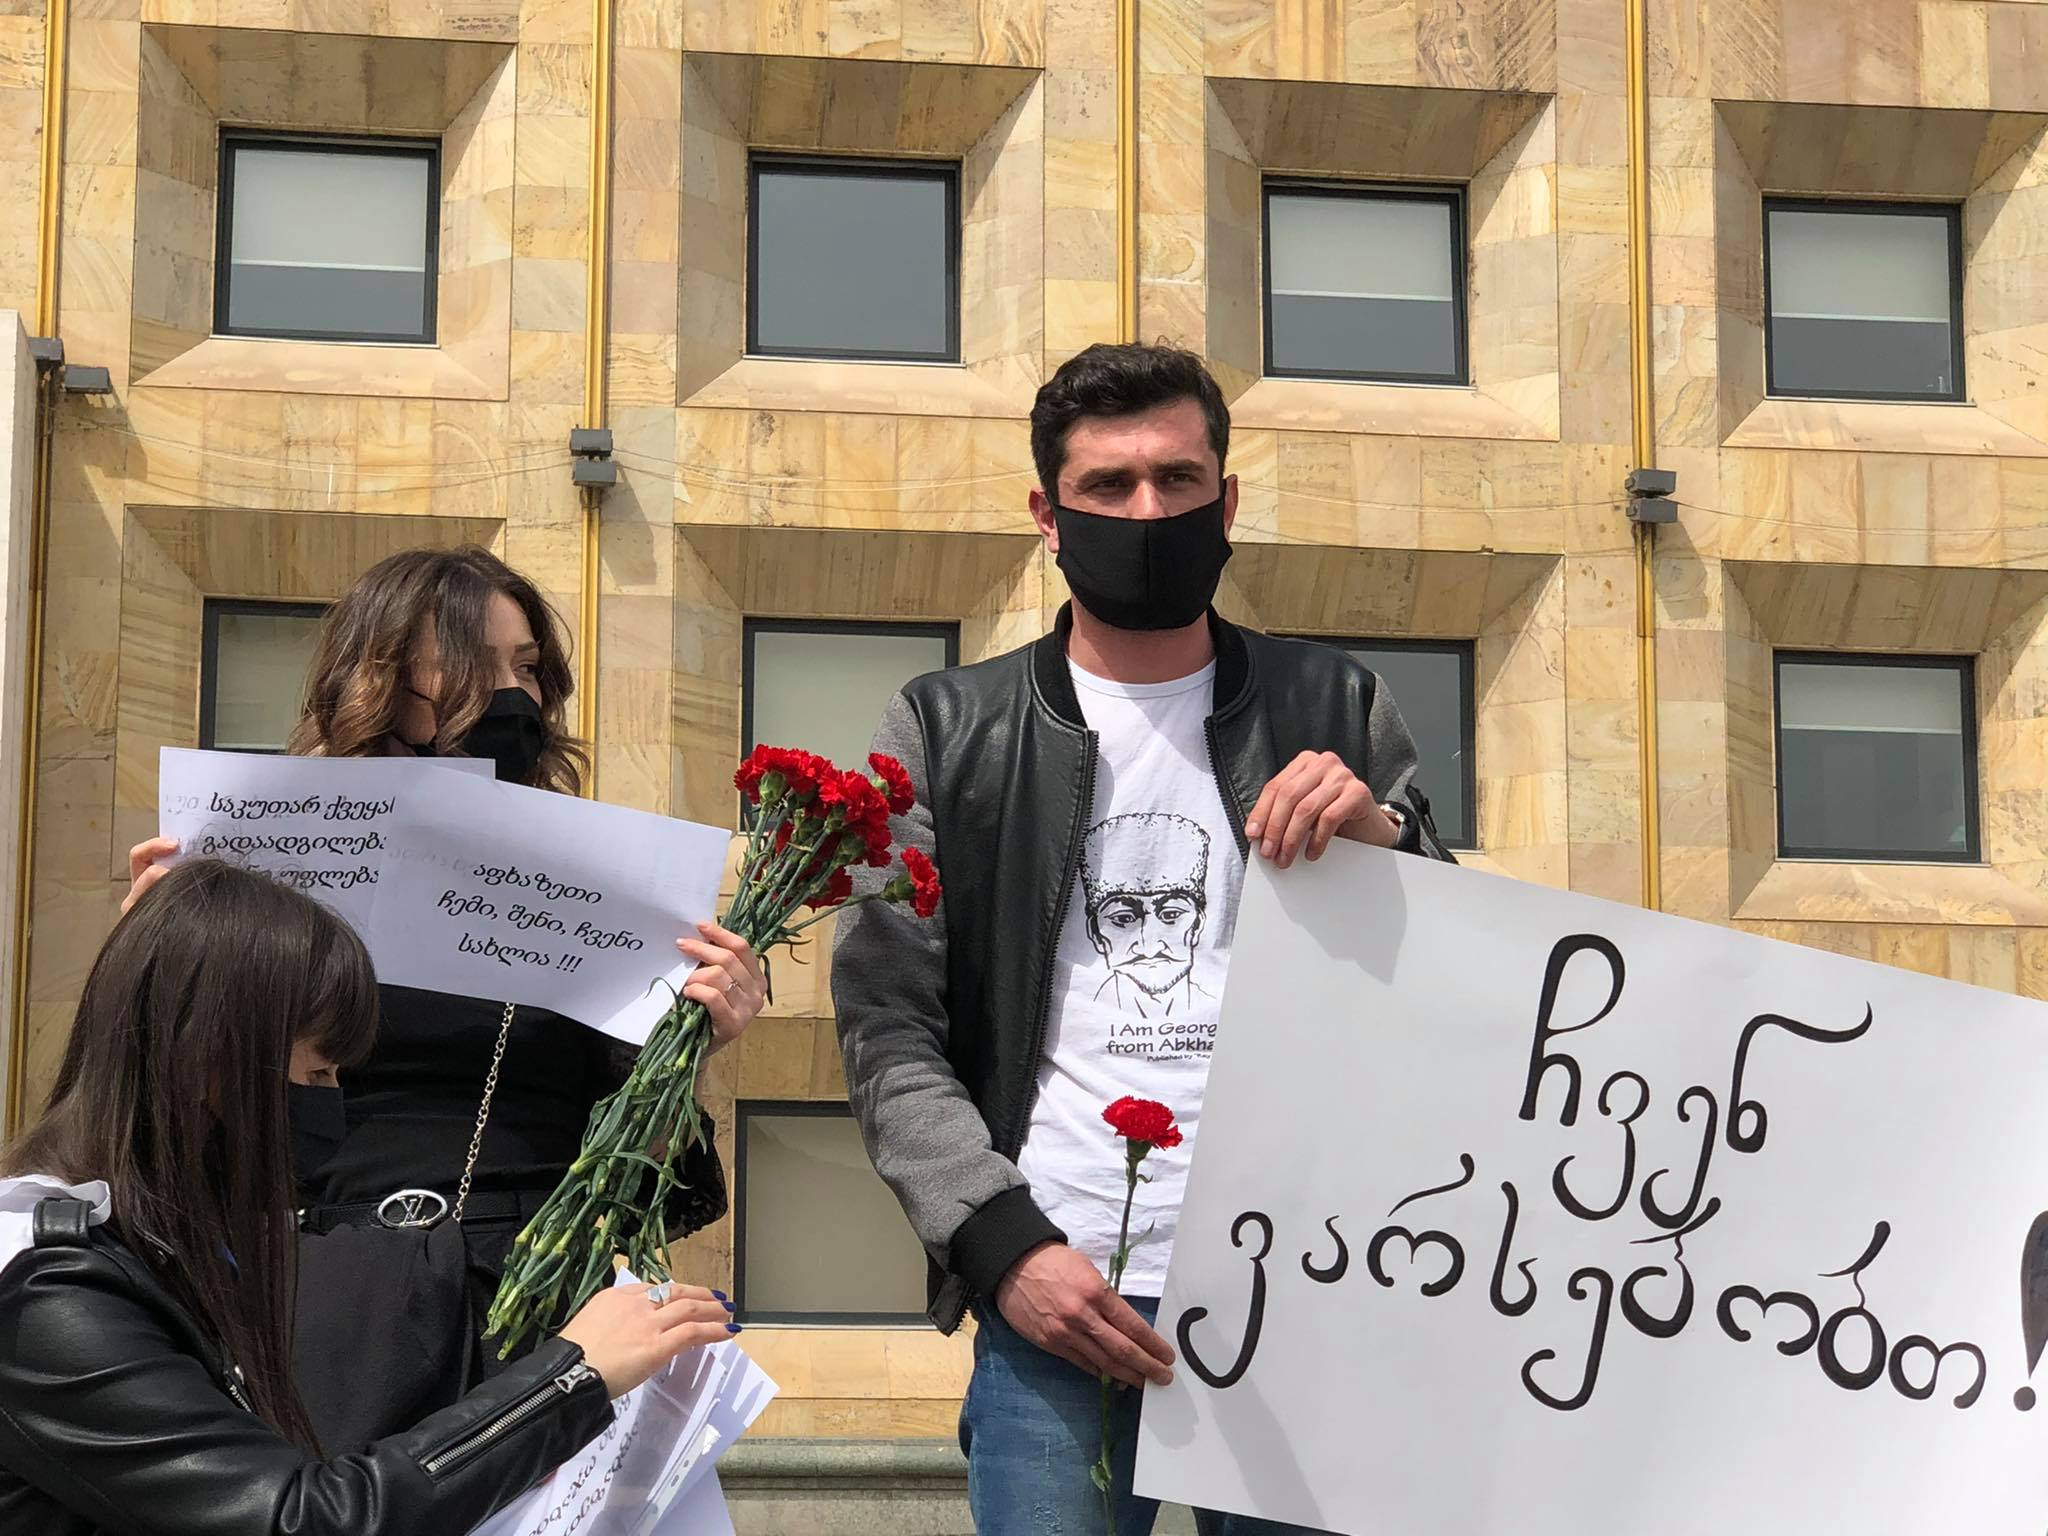 171299174 1452229731779983 982255956312851881 n #новости Абхазия, ингури